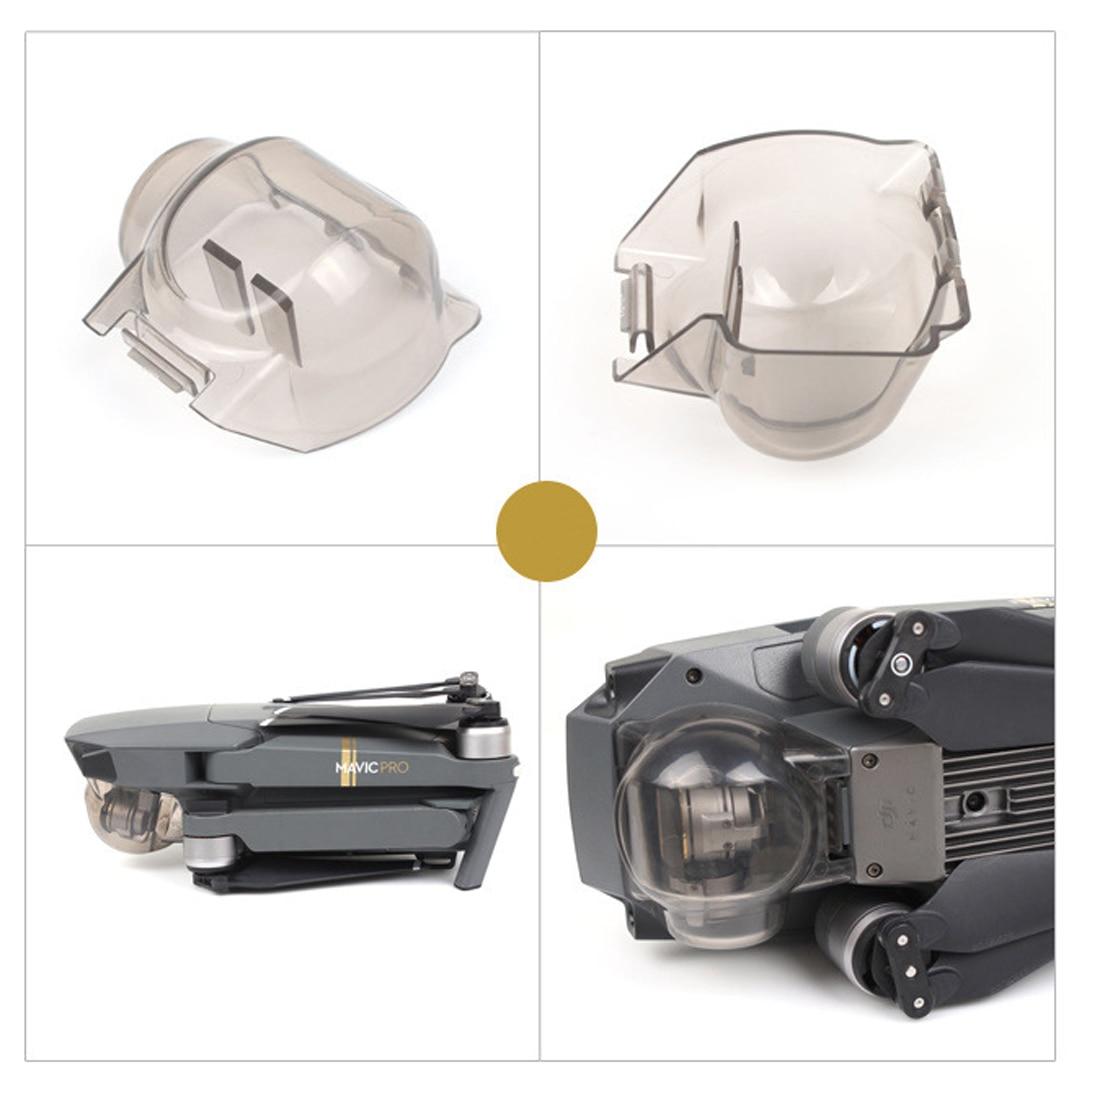 HOBBYINRC Transparent Lens  Protective Cover Gimbal Camera Clear Protection Cover Lens Protector Cap For DJI MAVIC PRO --Gray